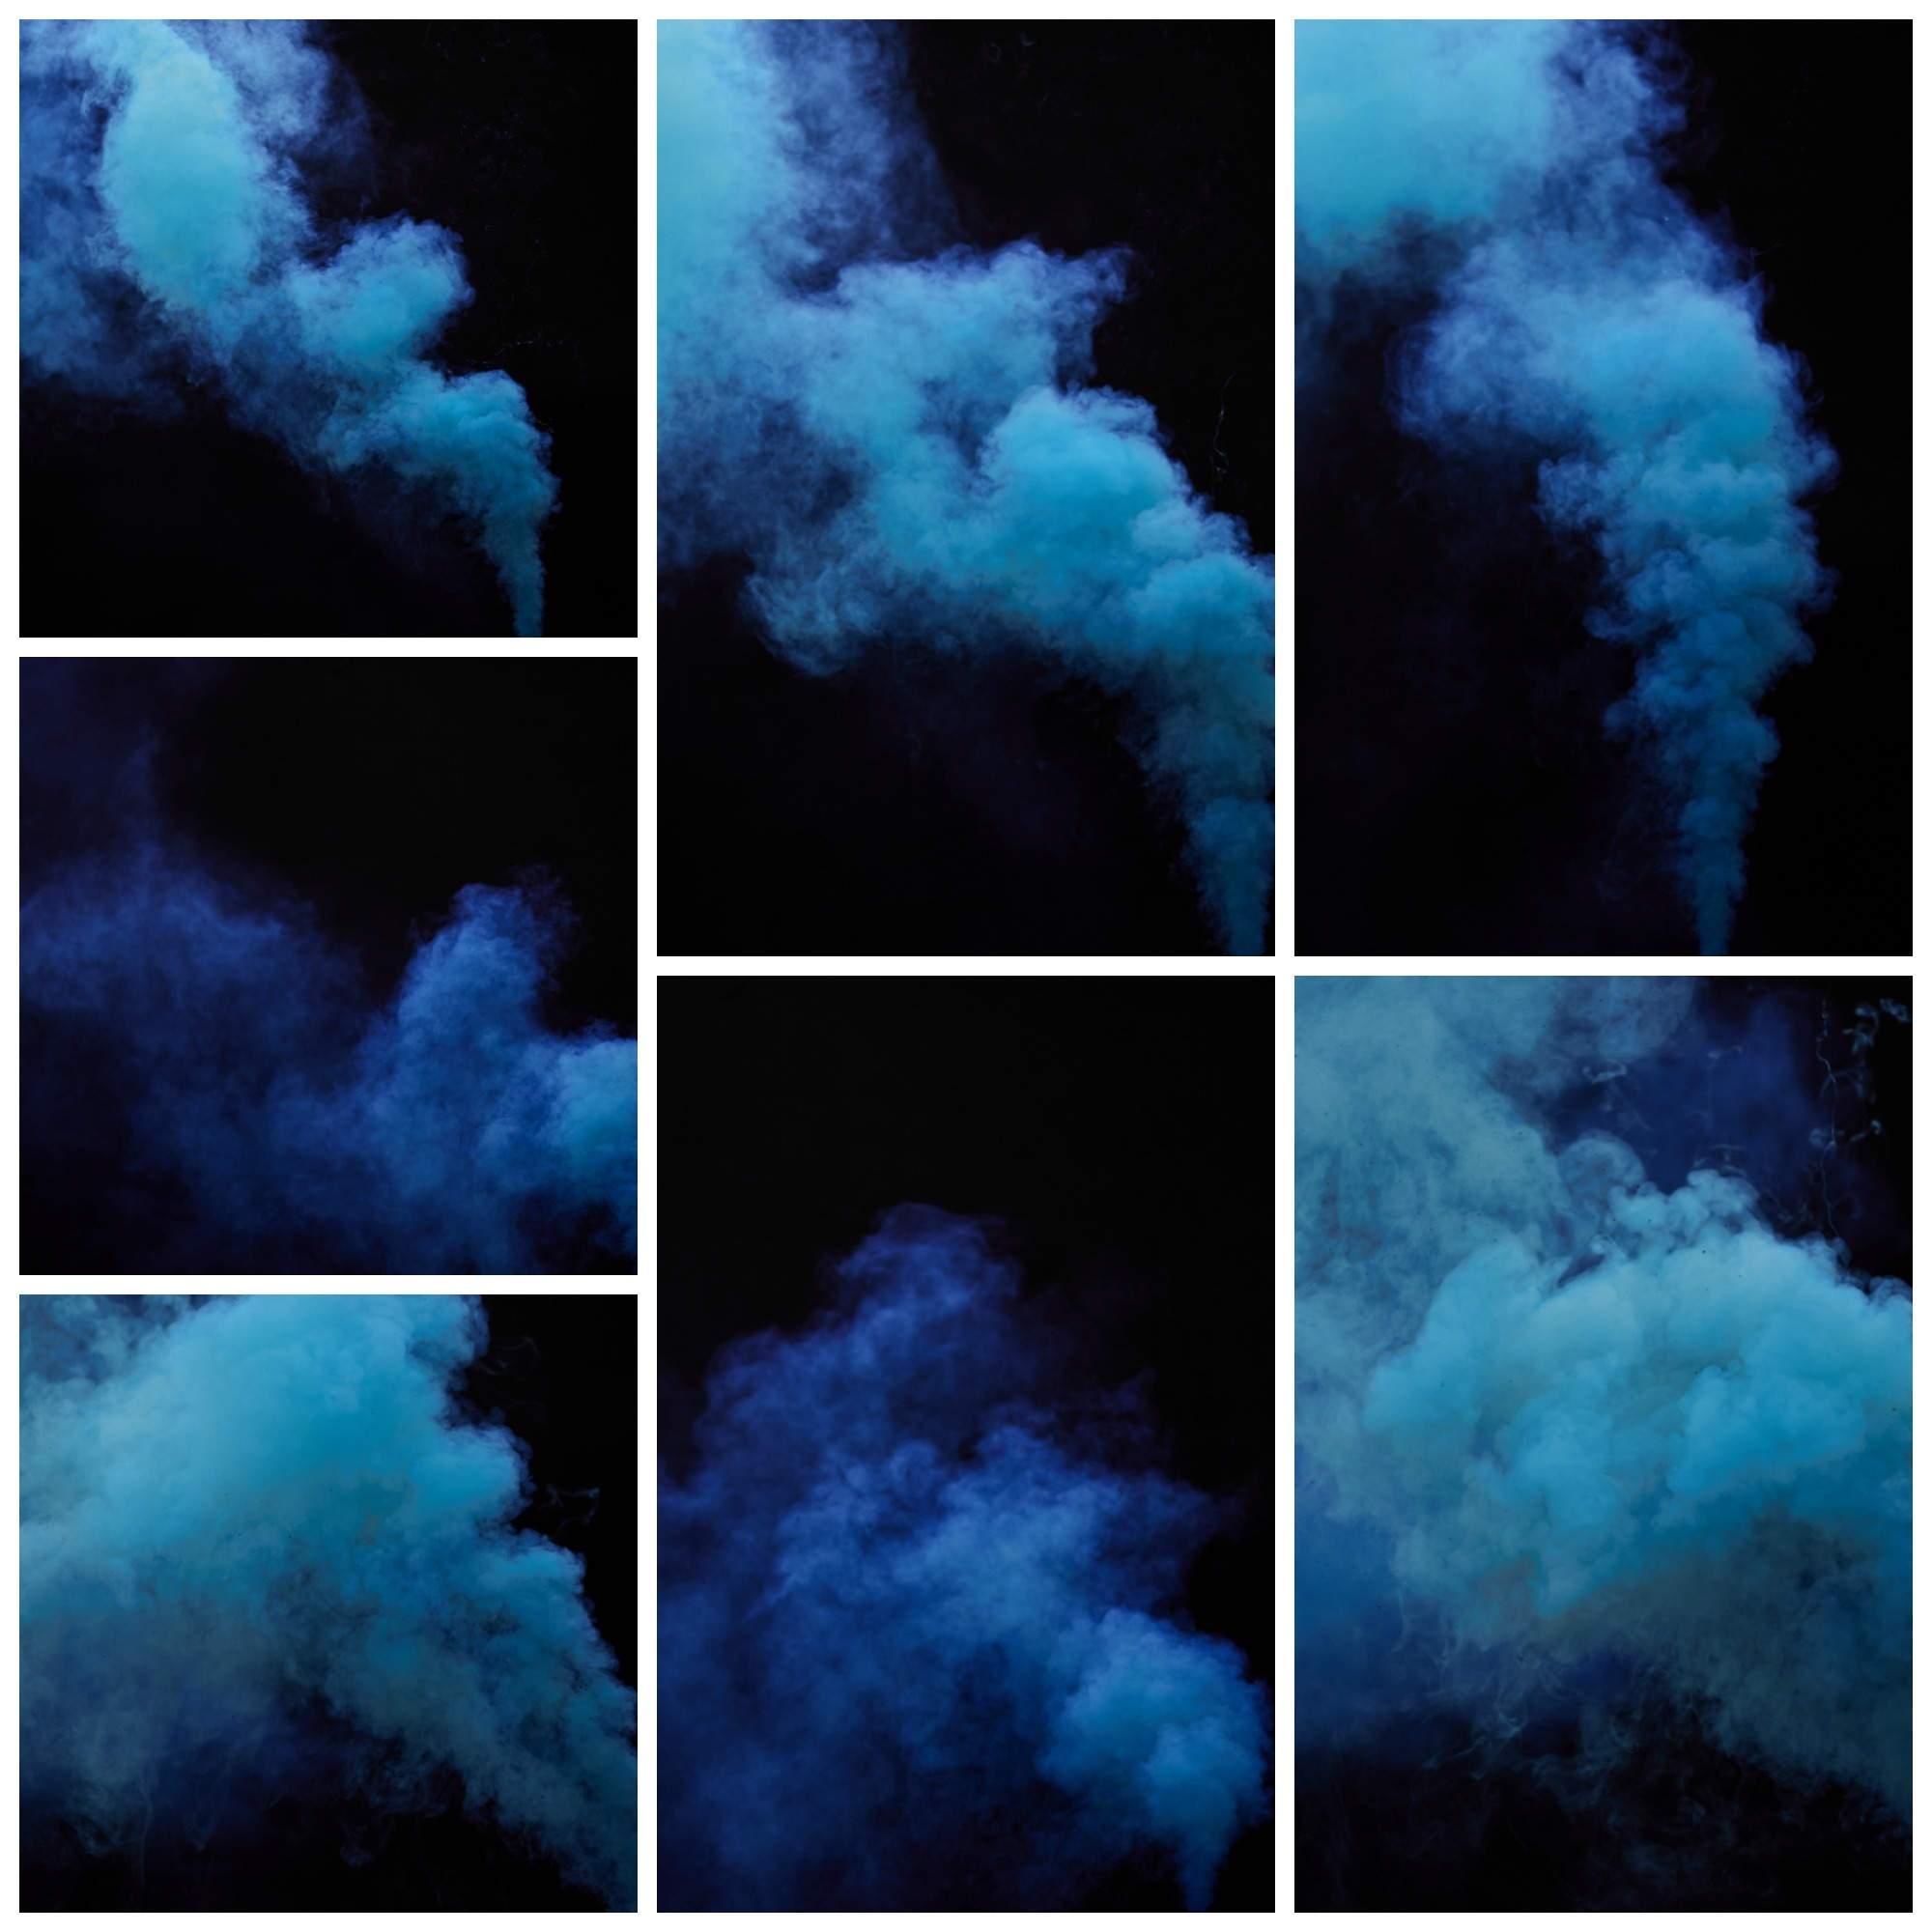 7 Blue Smoke Overlays - Artusco Design